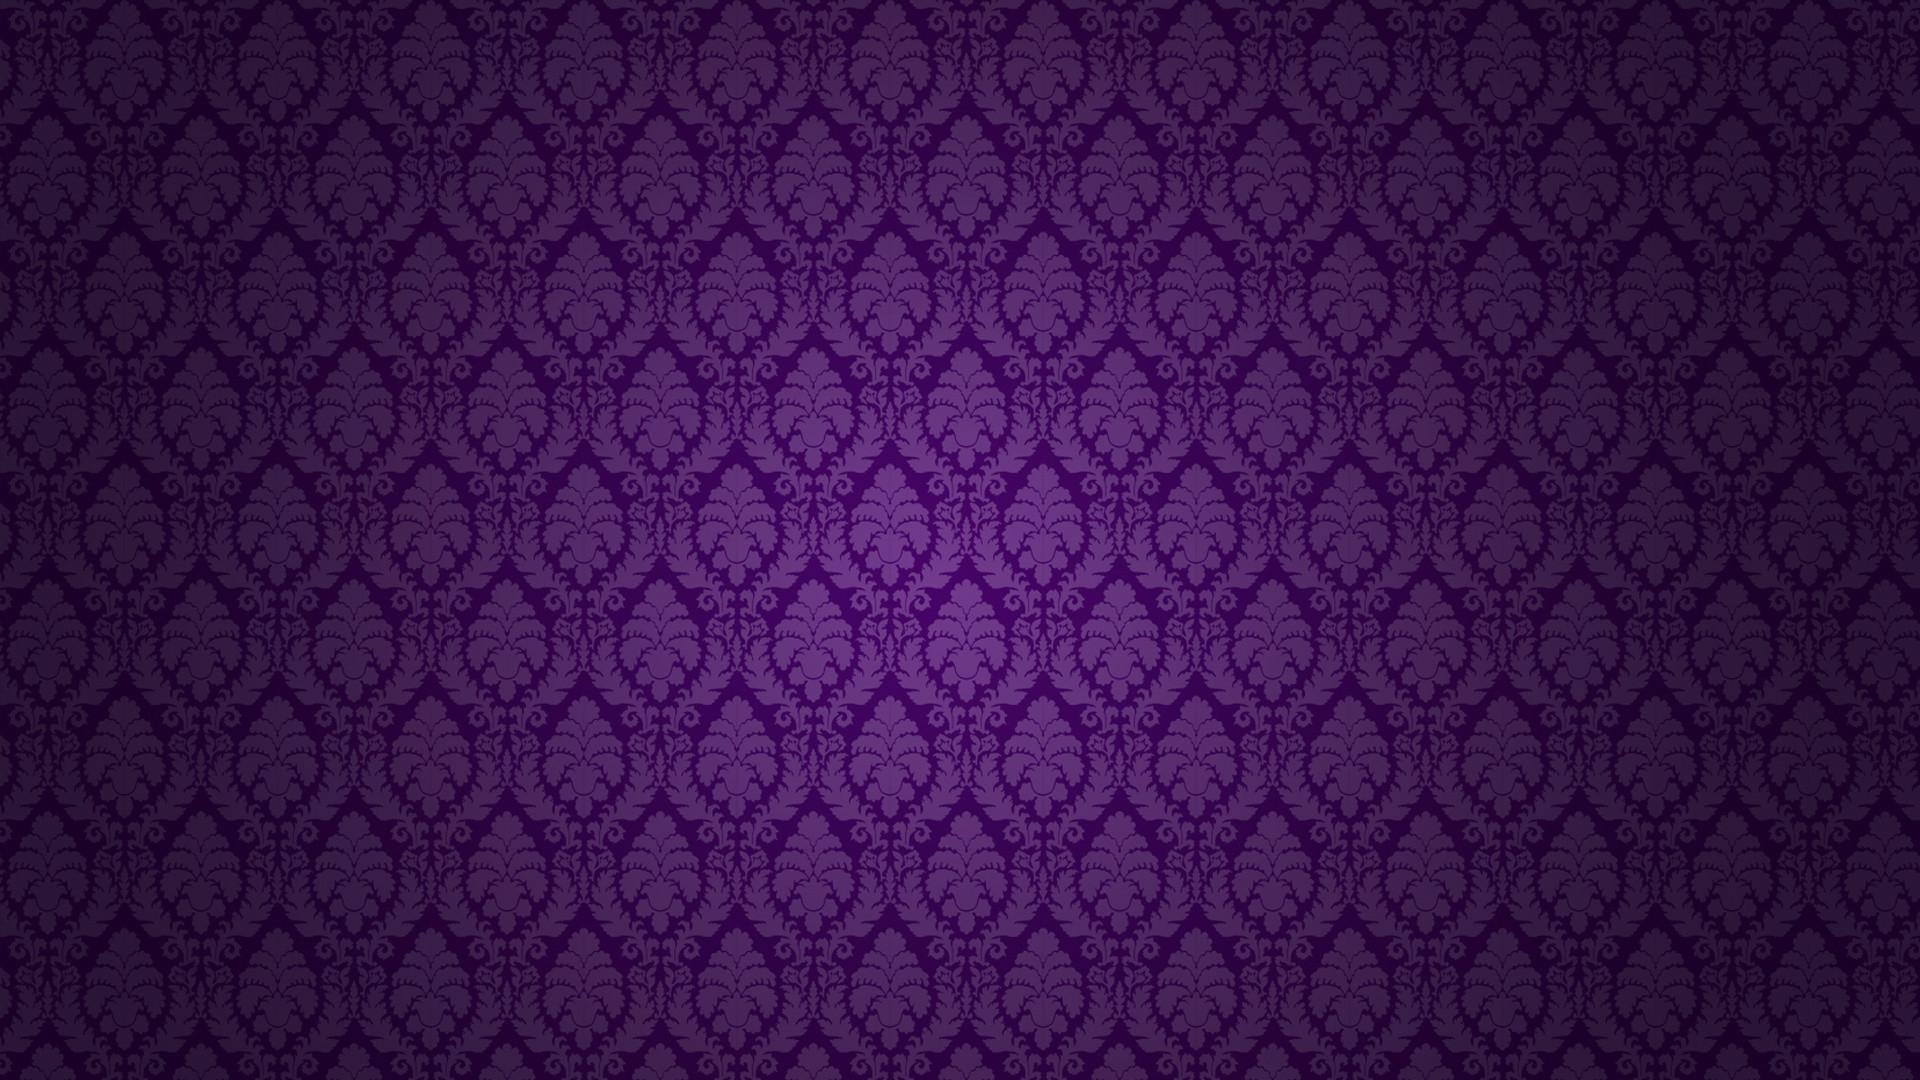 Purple Wallpaper Vintage Wall 1080p #7096 Wallpaper | Cool .